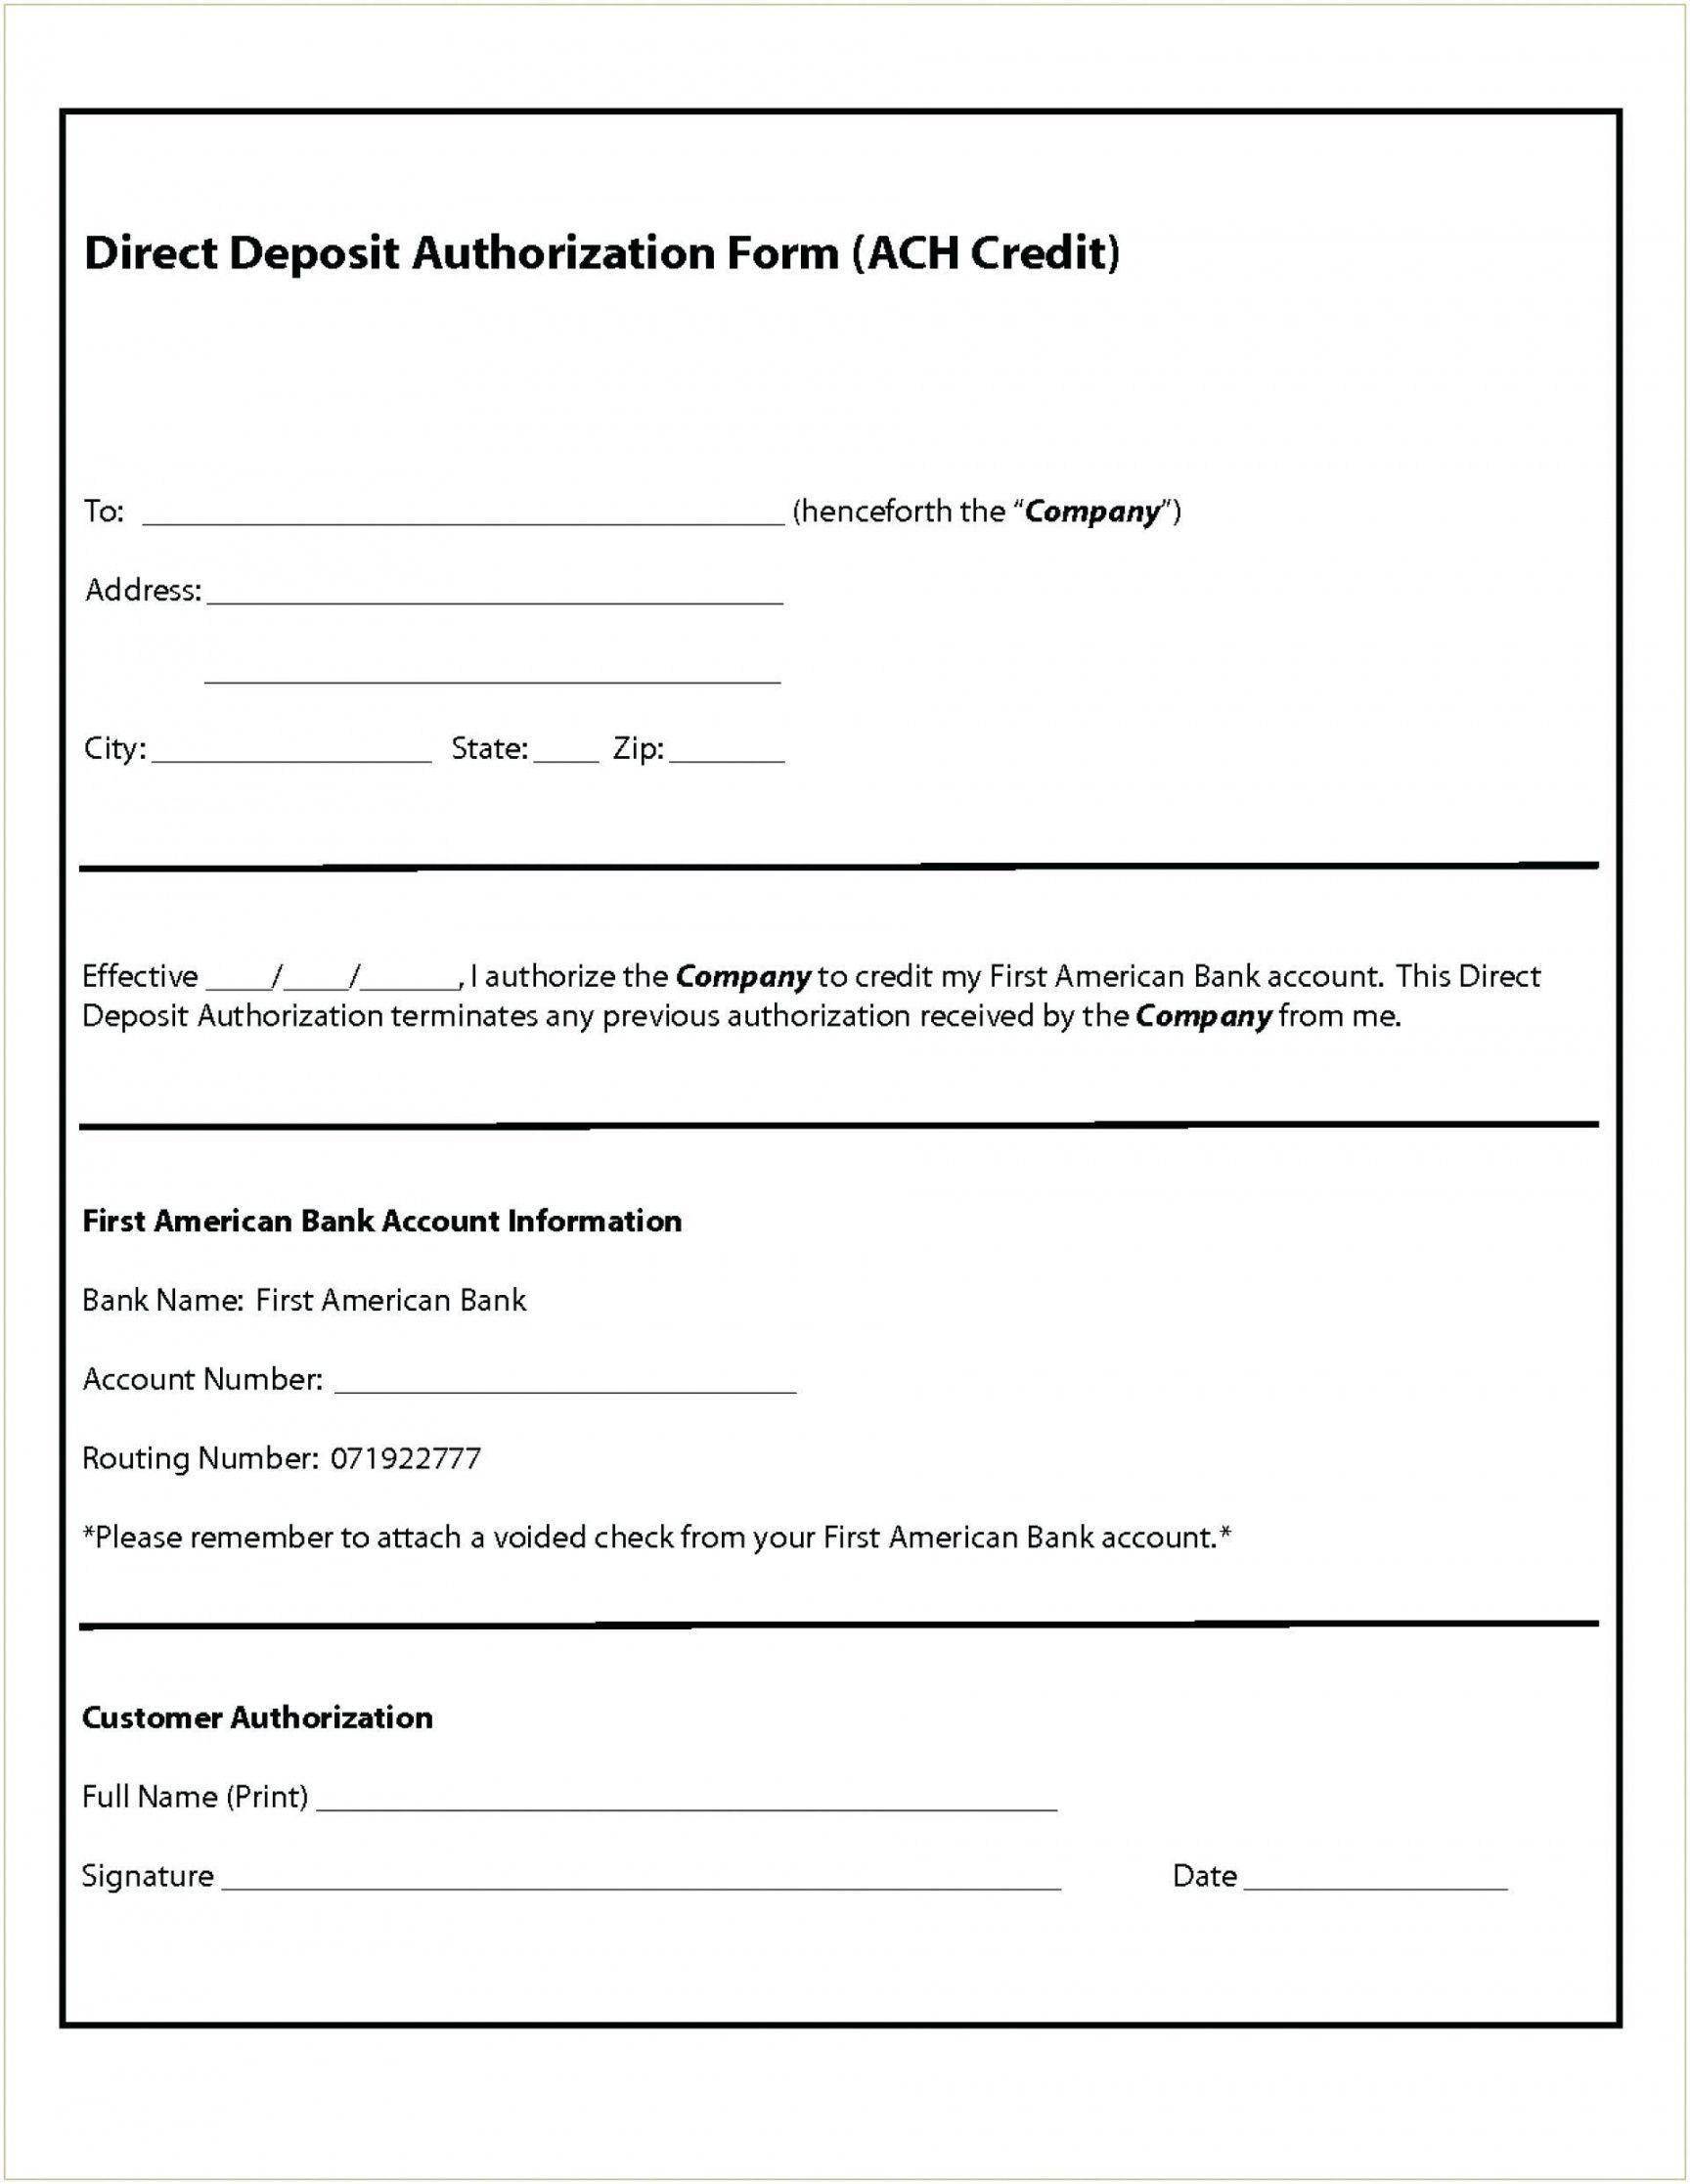 editable 015 ach direct deposit authorization form template breatht generic direct deposit authorization form pdf